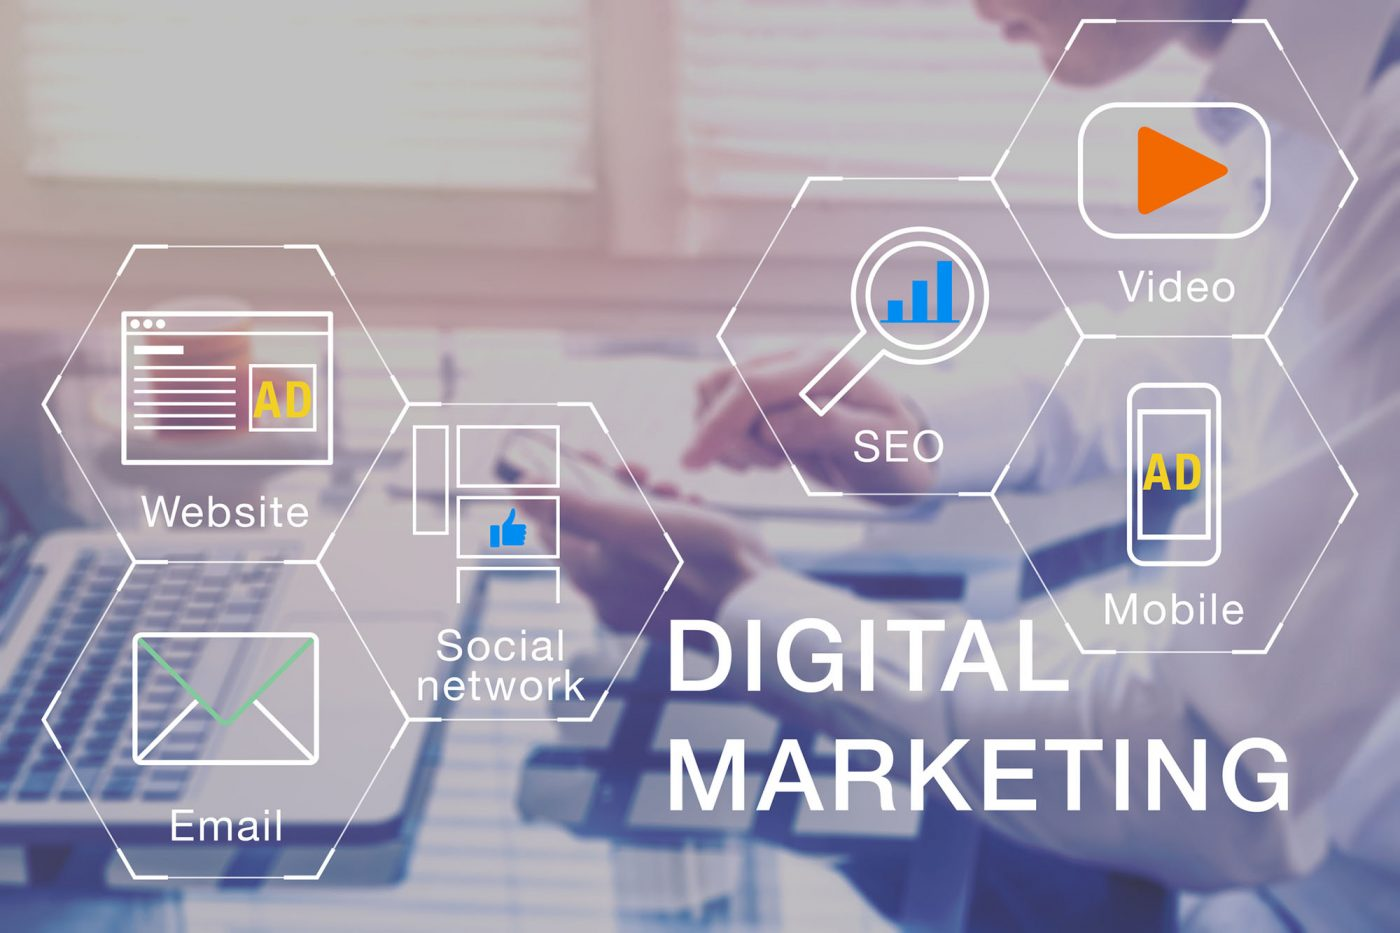 Digital Marketing Services In Uganda